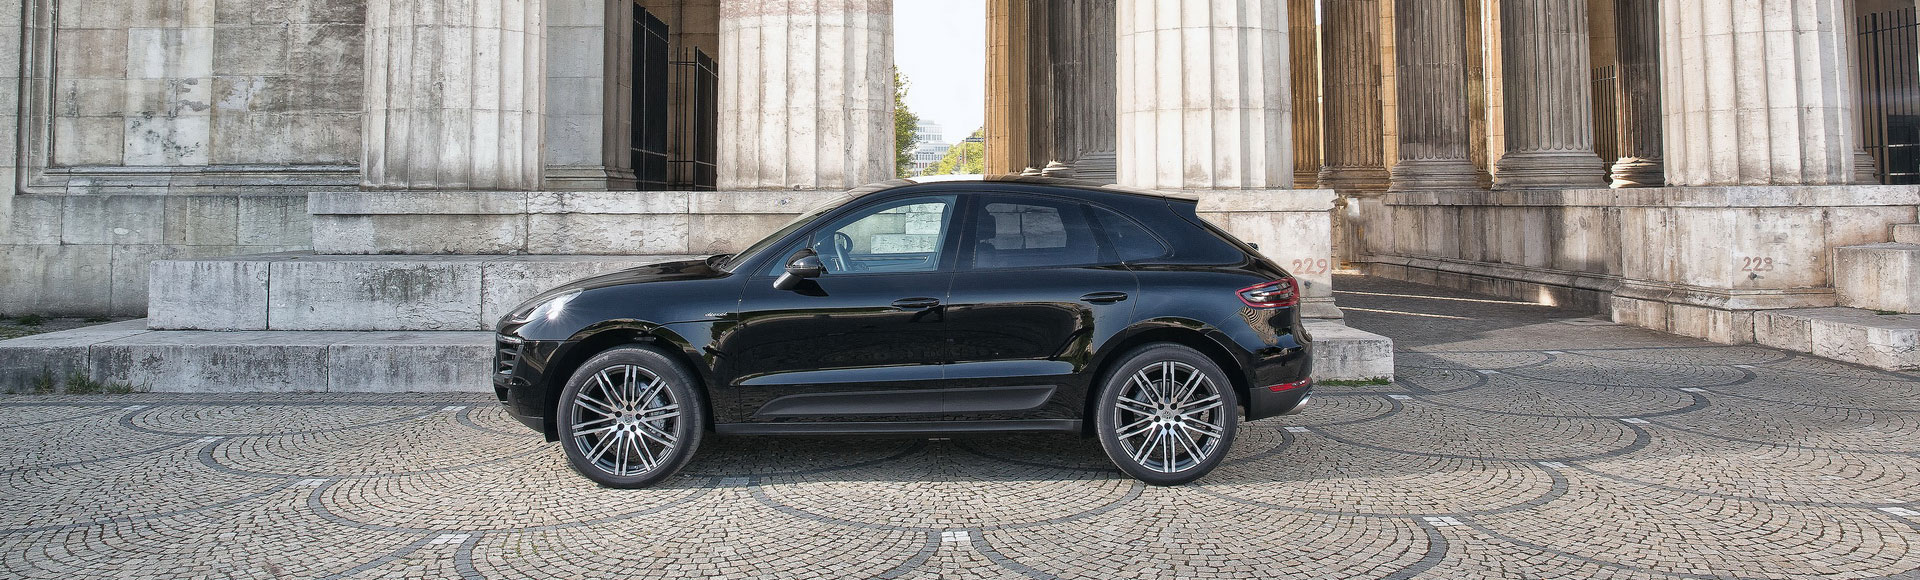 Porsche Macan 2014 Sommer 31519